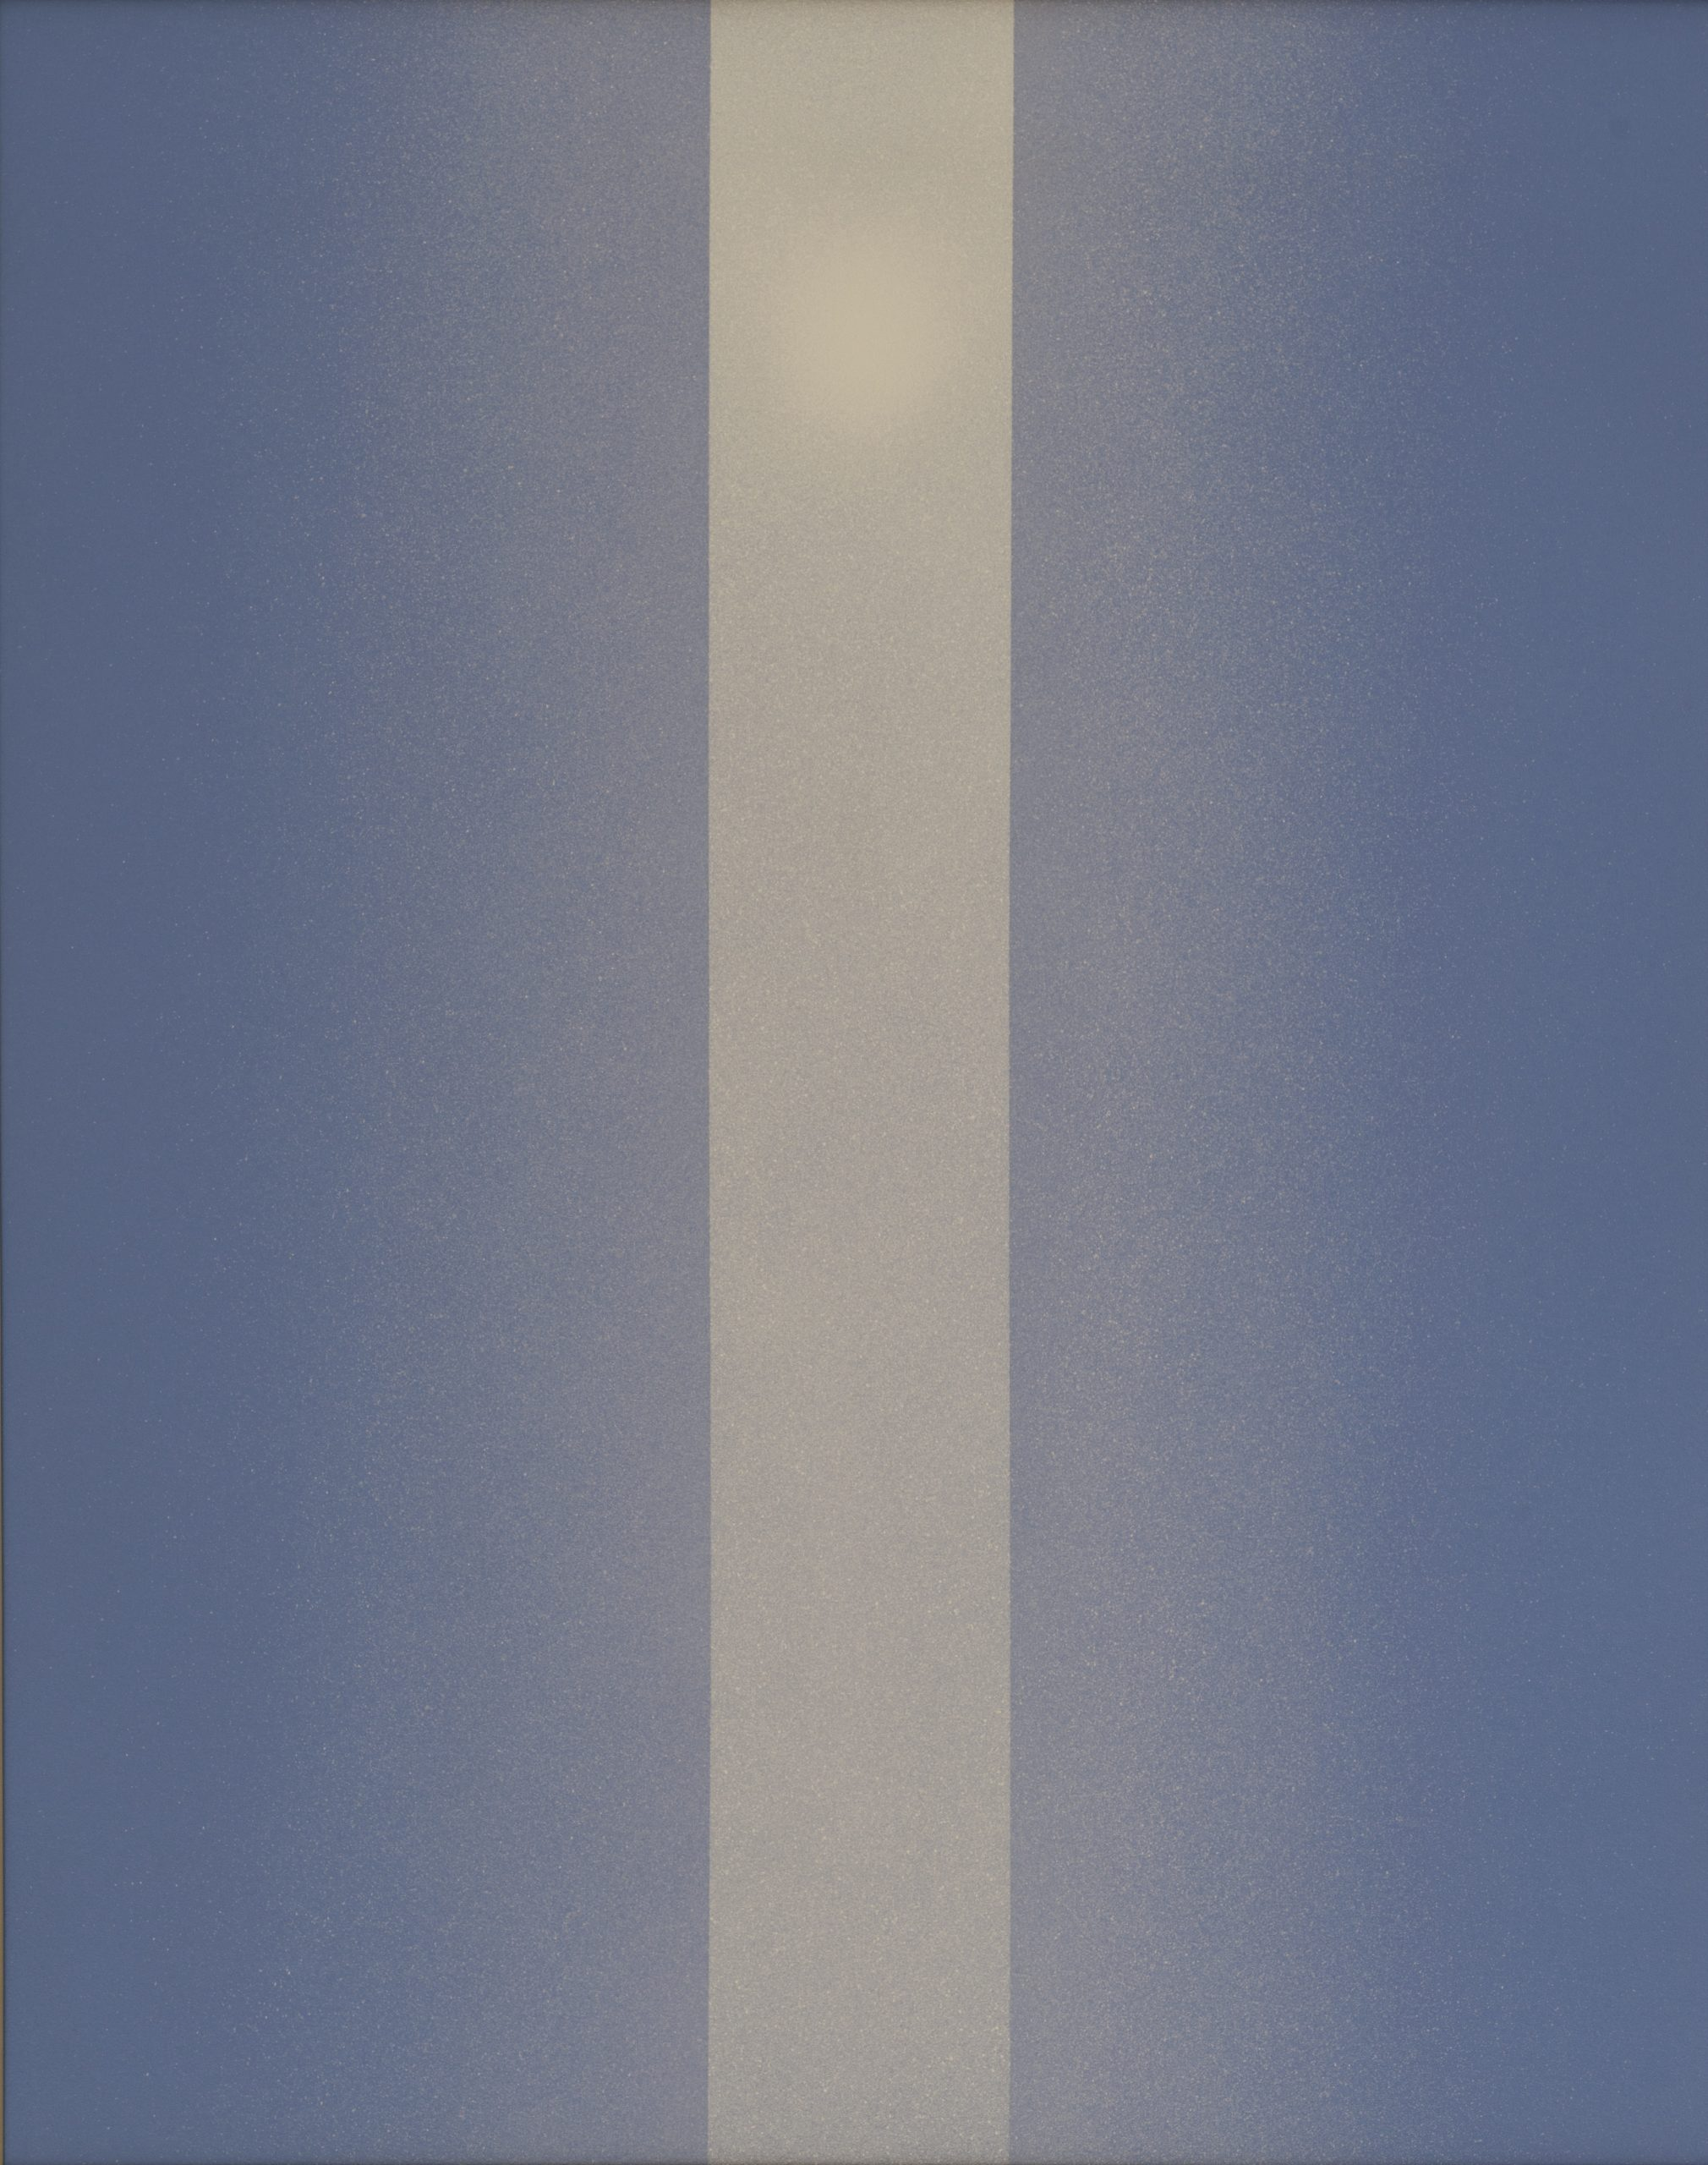 Light - A Trilogy (Polymer No. 12), 1966, Acrylic on Masonite